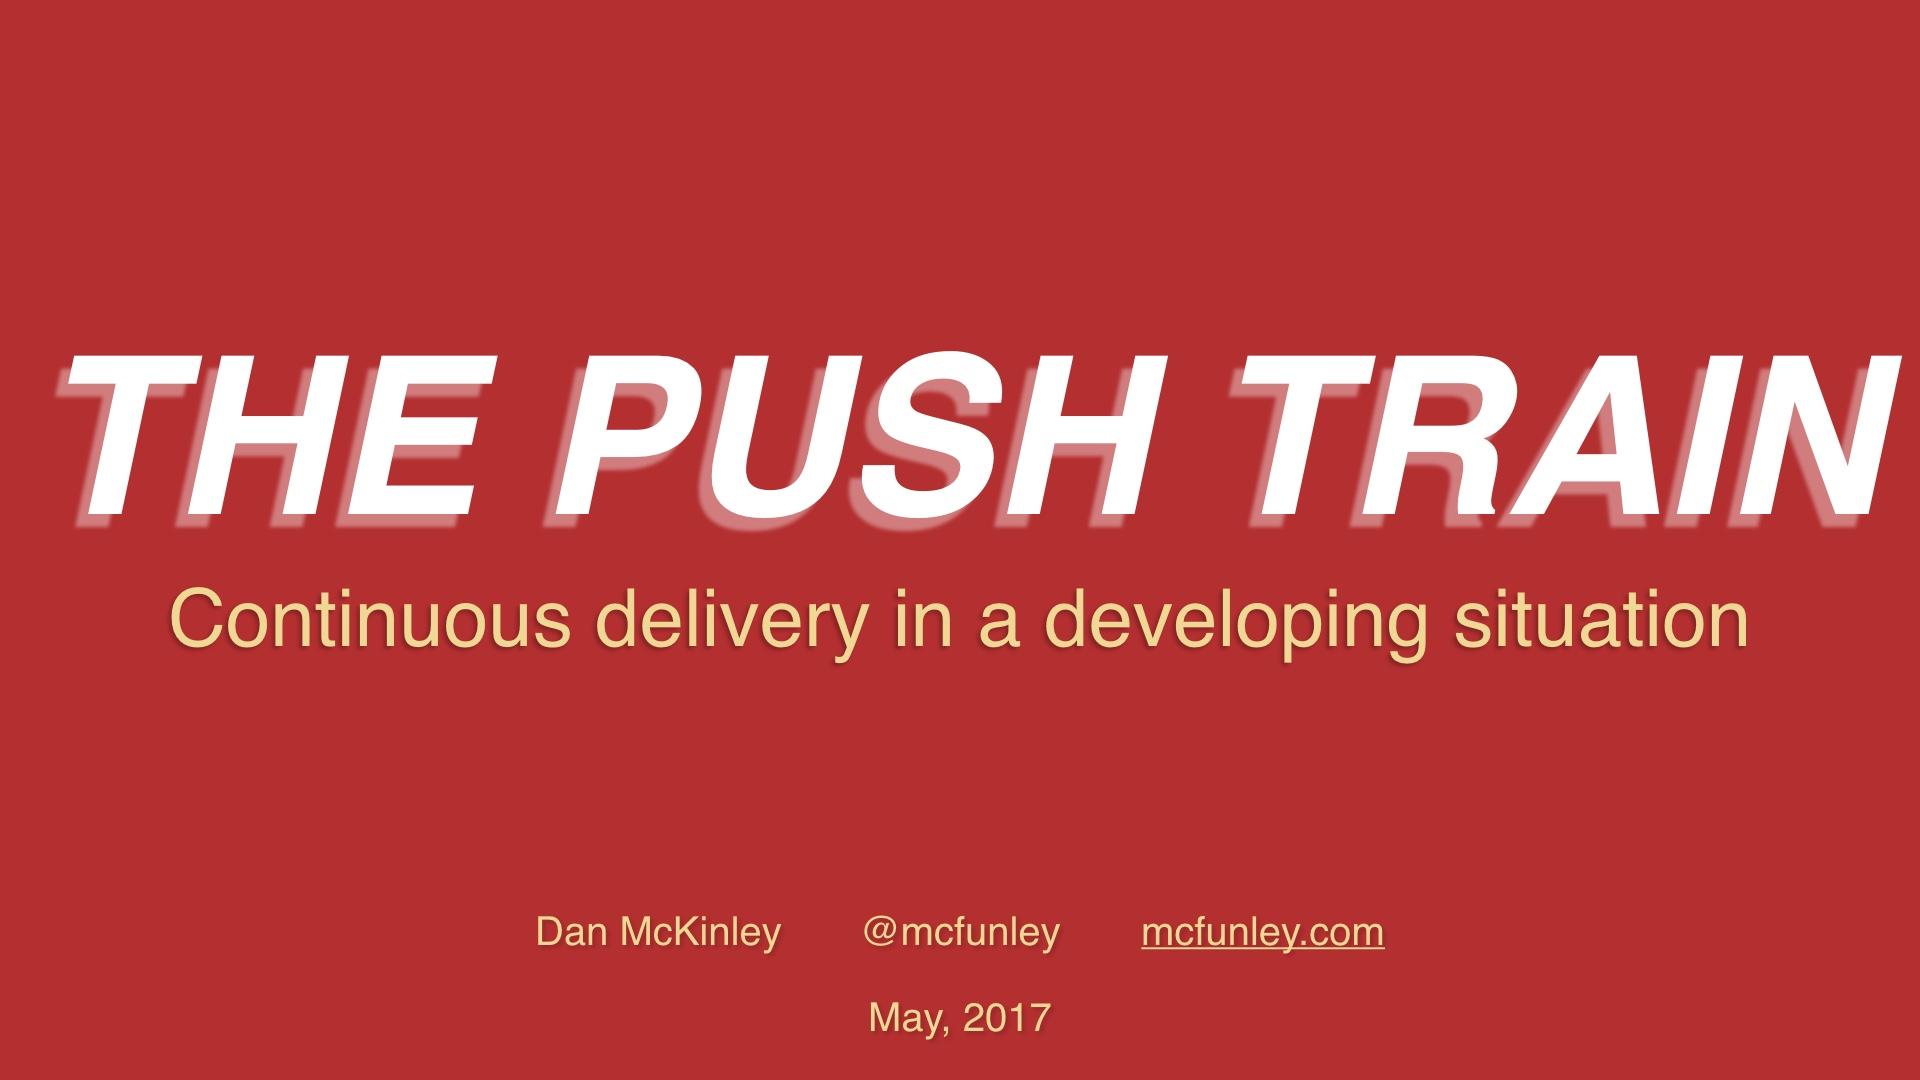 The Push Train